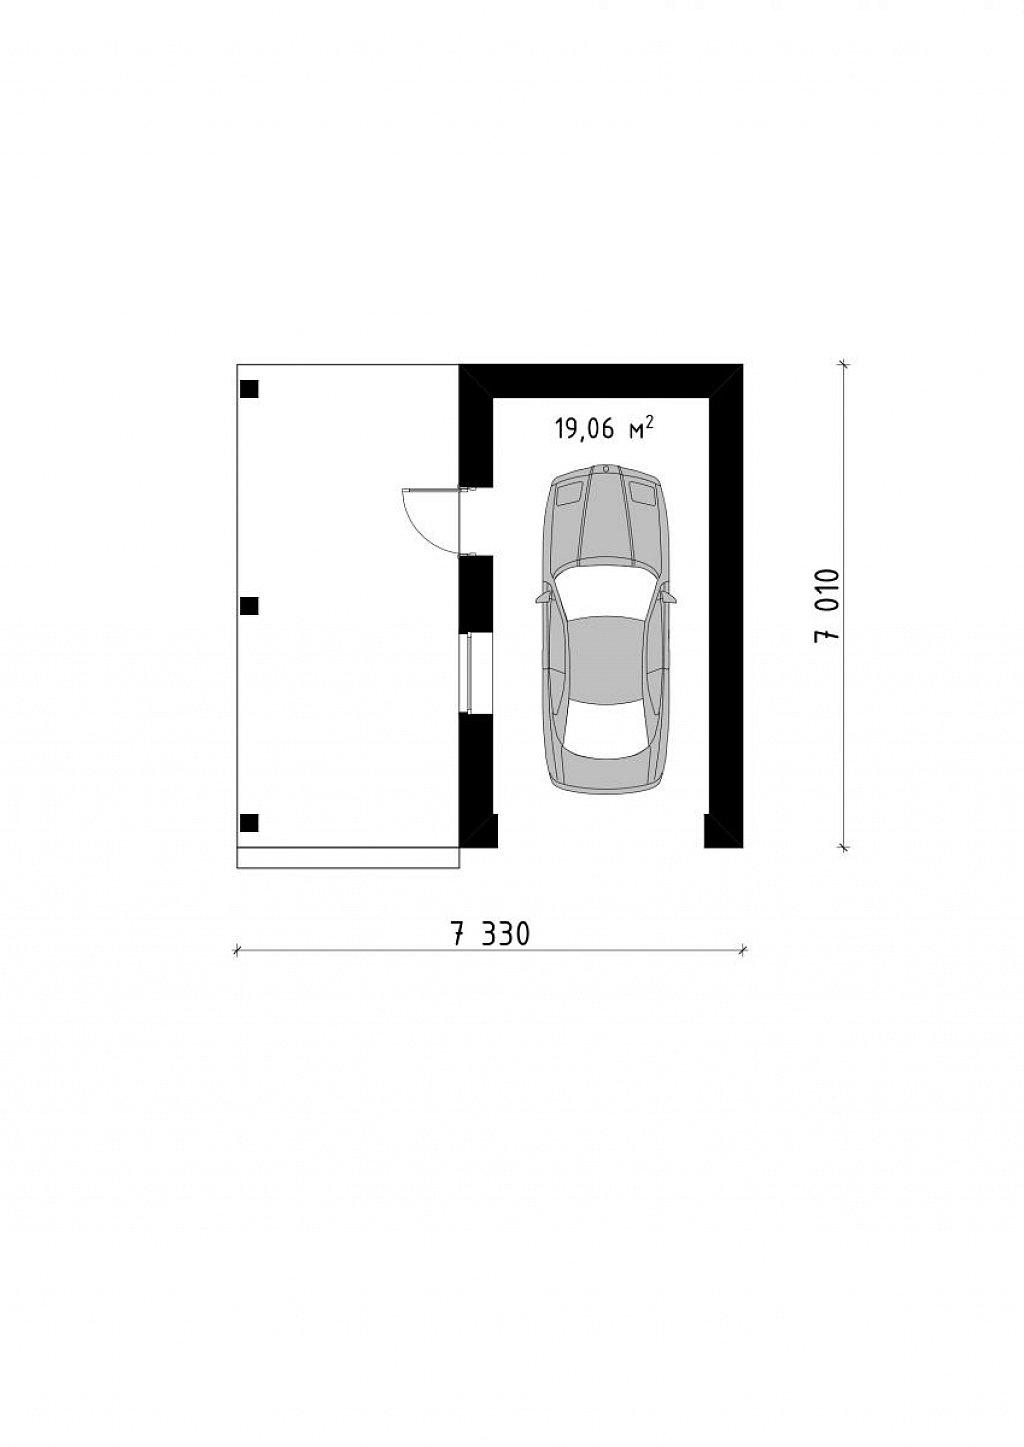 Площадь 18,2 м² гаража Zg13